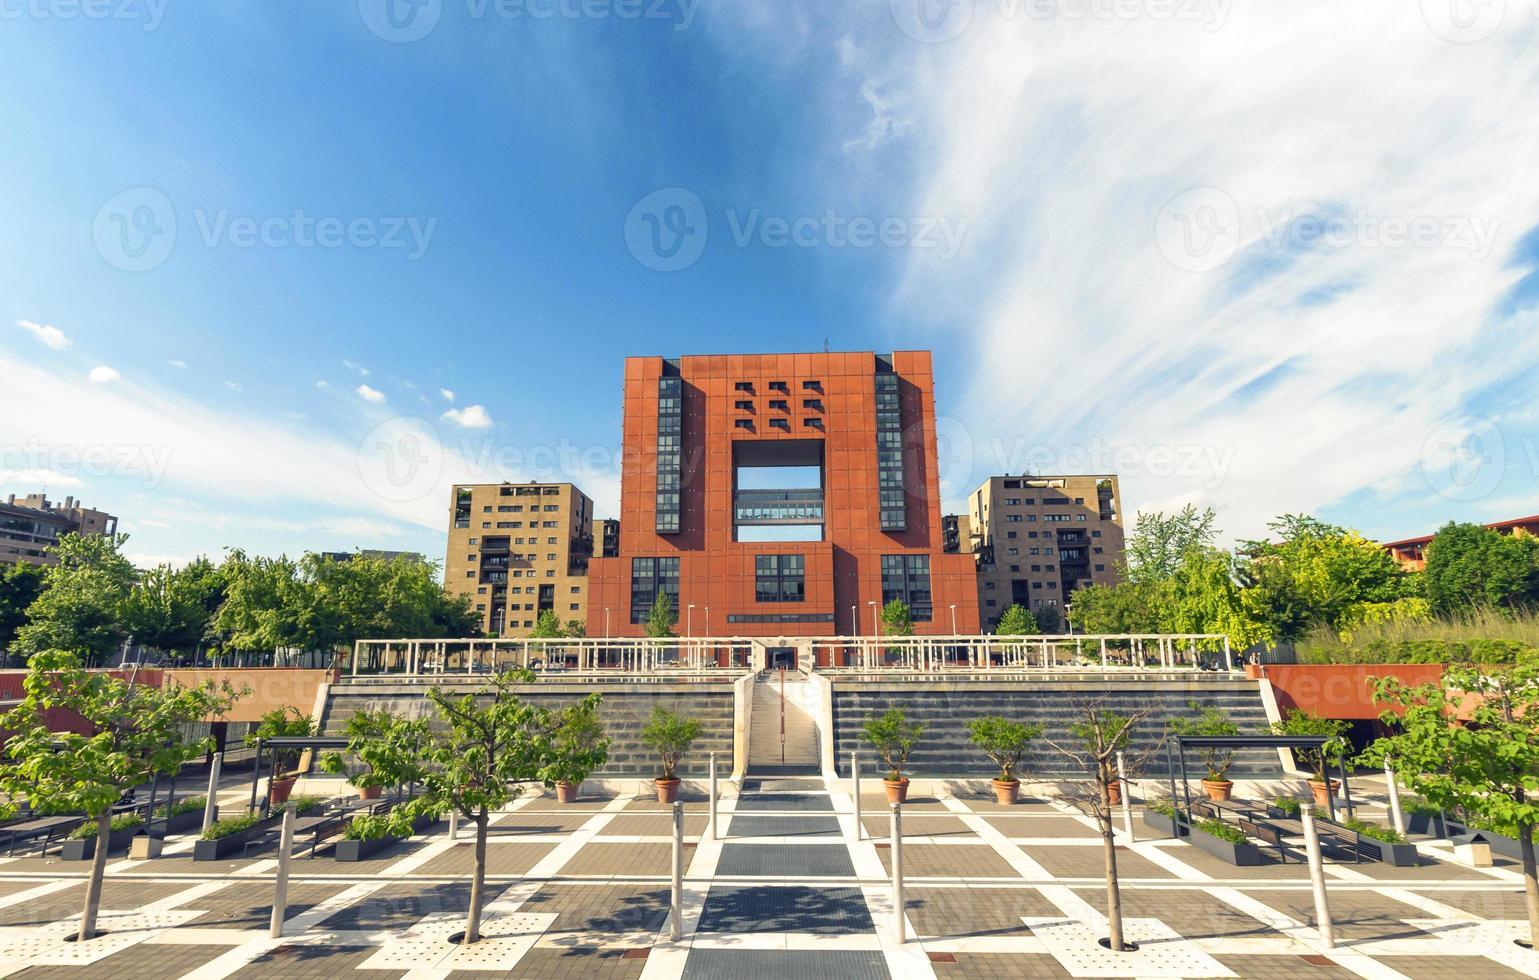 universidad de bicocca, milán italia foto